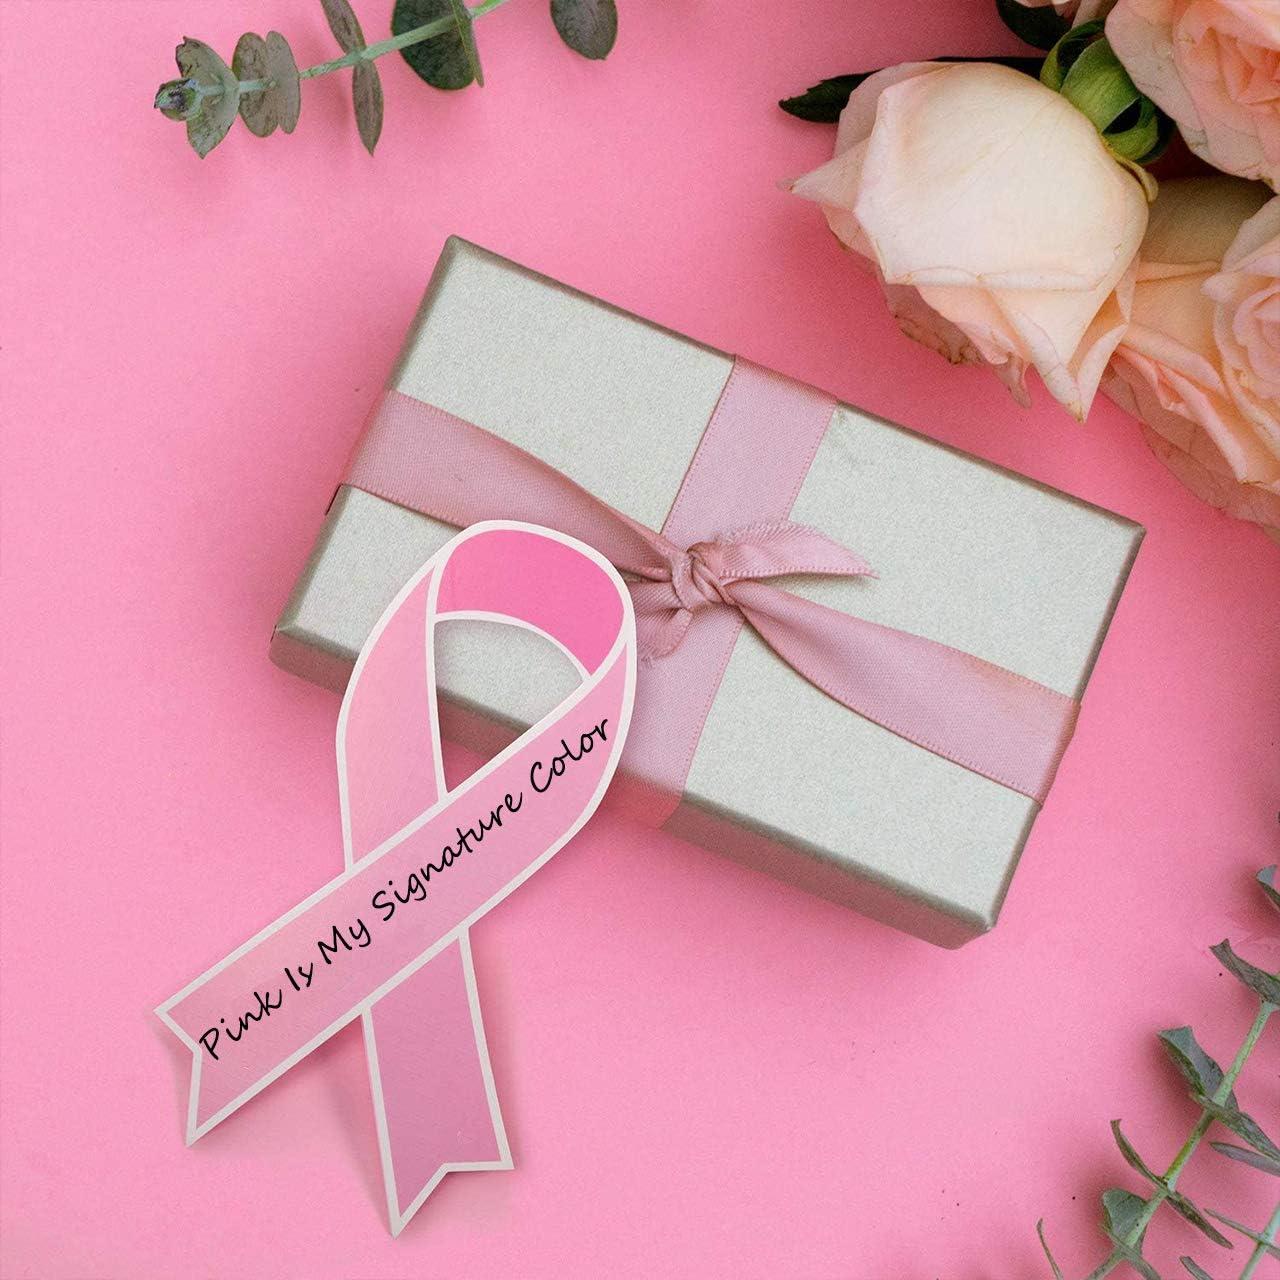 100 Pcs Pink Wooden Clips and 25 Yard Ribbon 100 Pcs Cutouts Support Cards Breast Cancer Awareness Pink Paper Ribbon